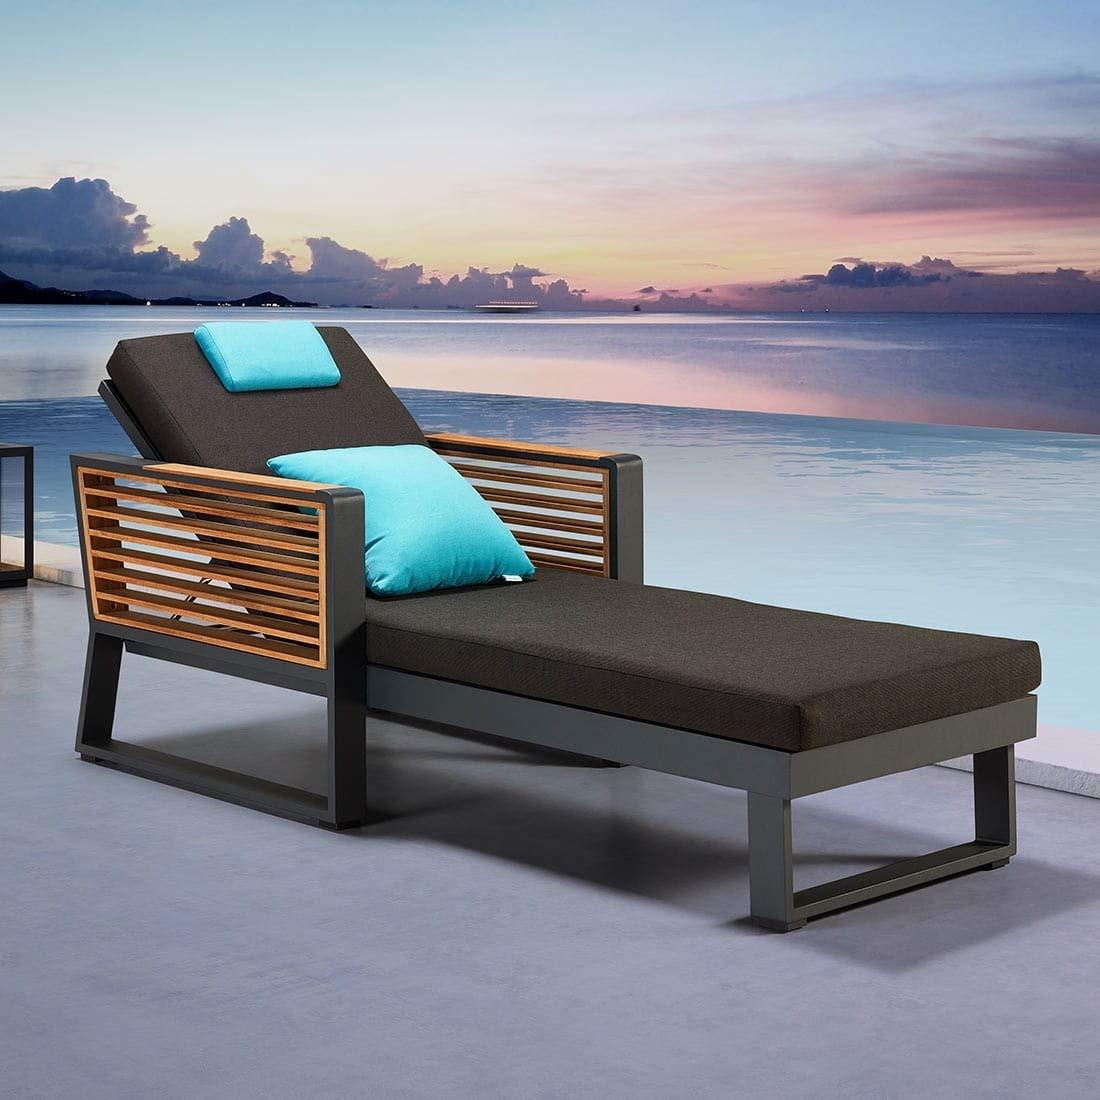 OUTLIV. Loungemöbel Outdoor New York Loungeliege Aluminium/Teak/Olefin Gartenlounge Outdoor Lounge Garten Terrasse Balkon